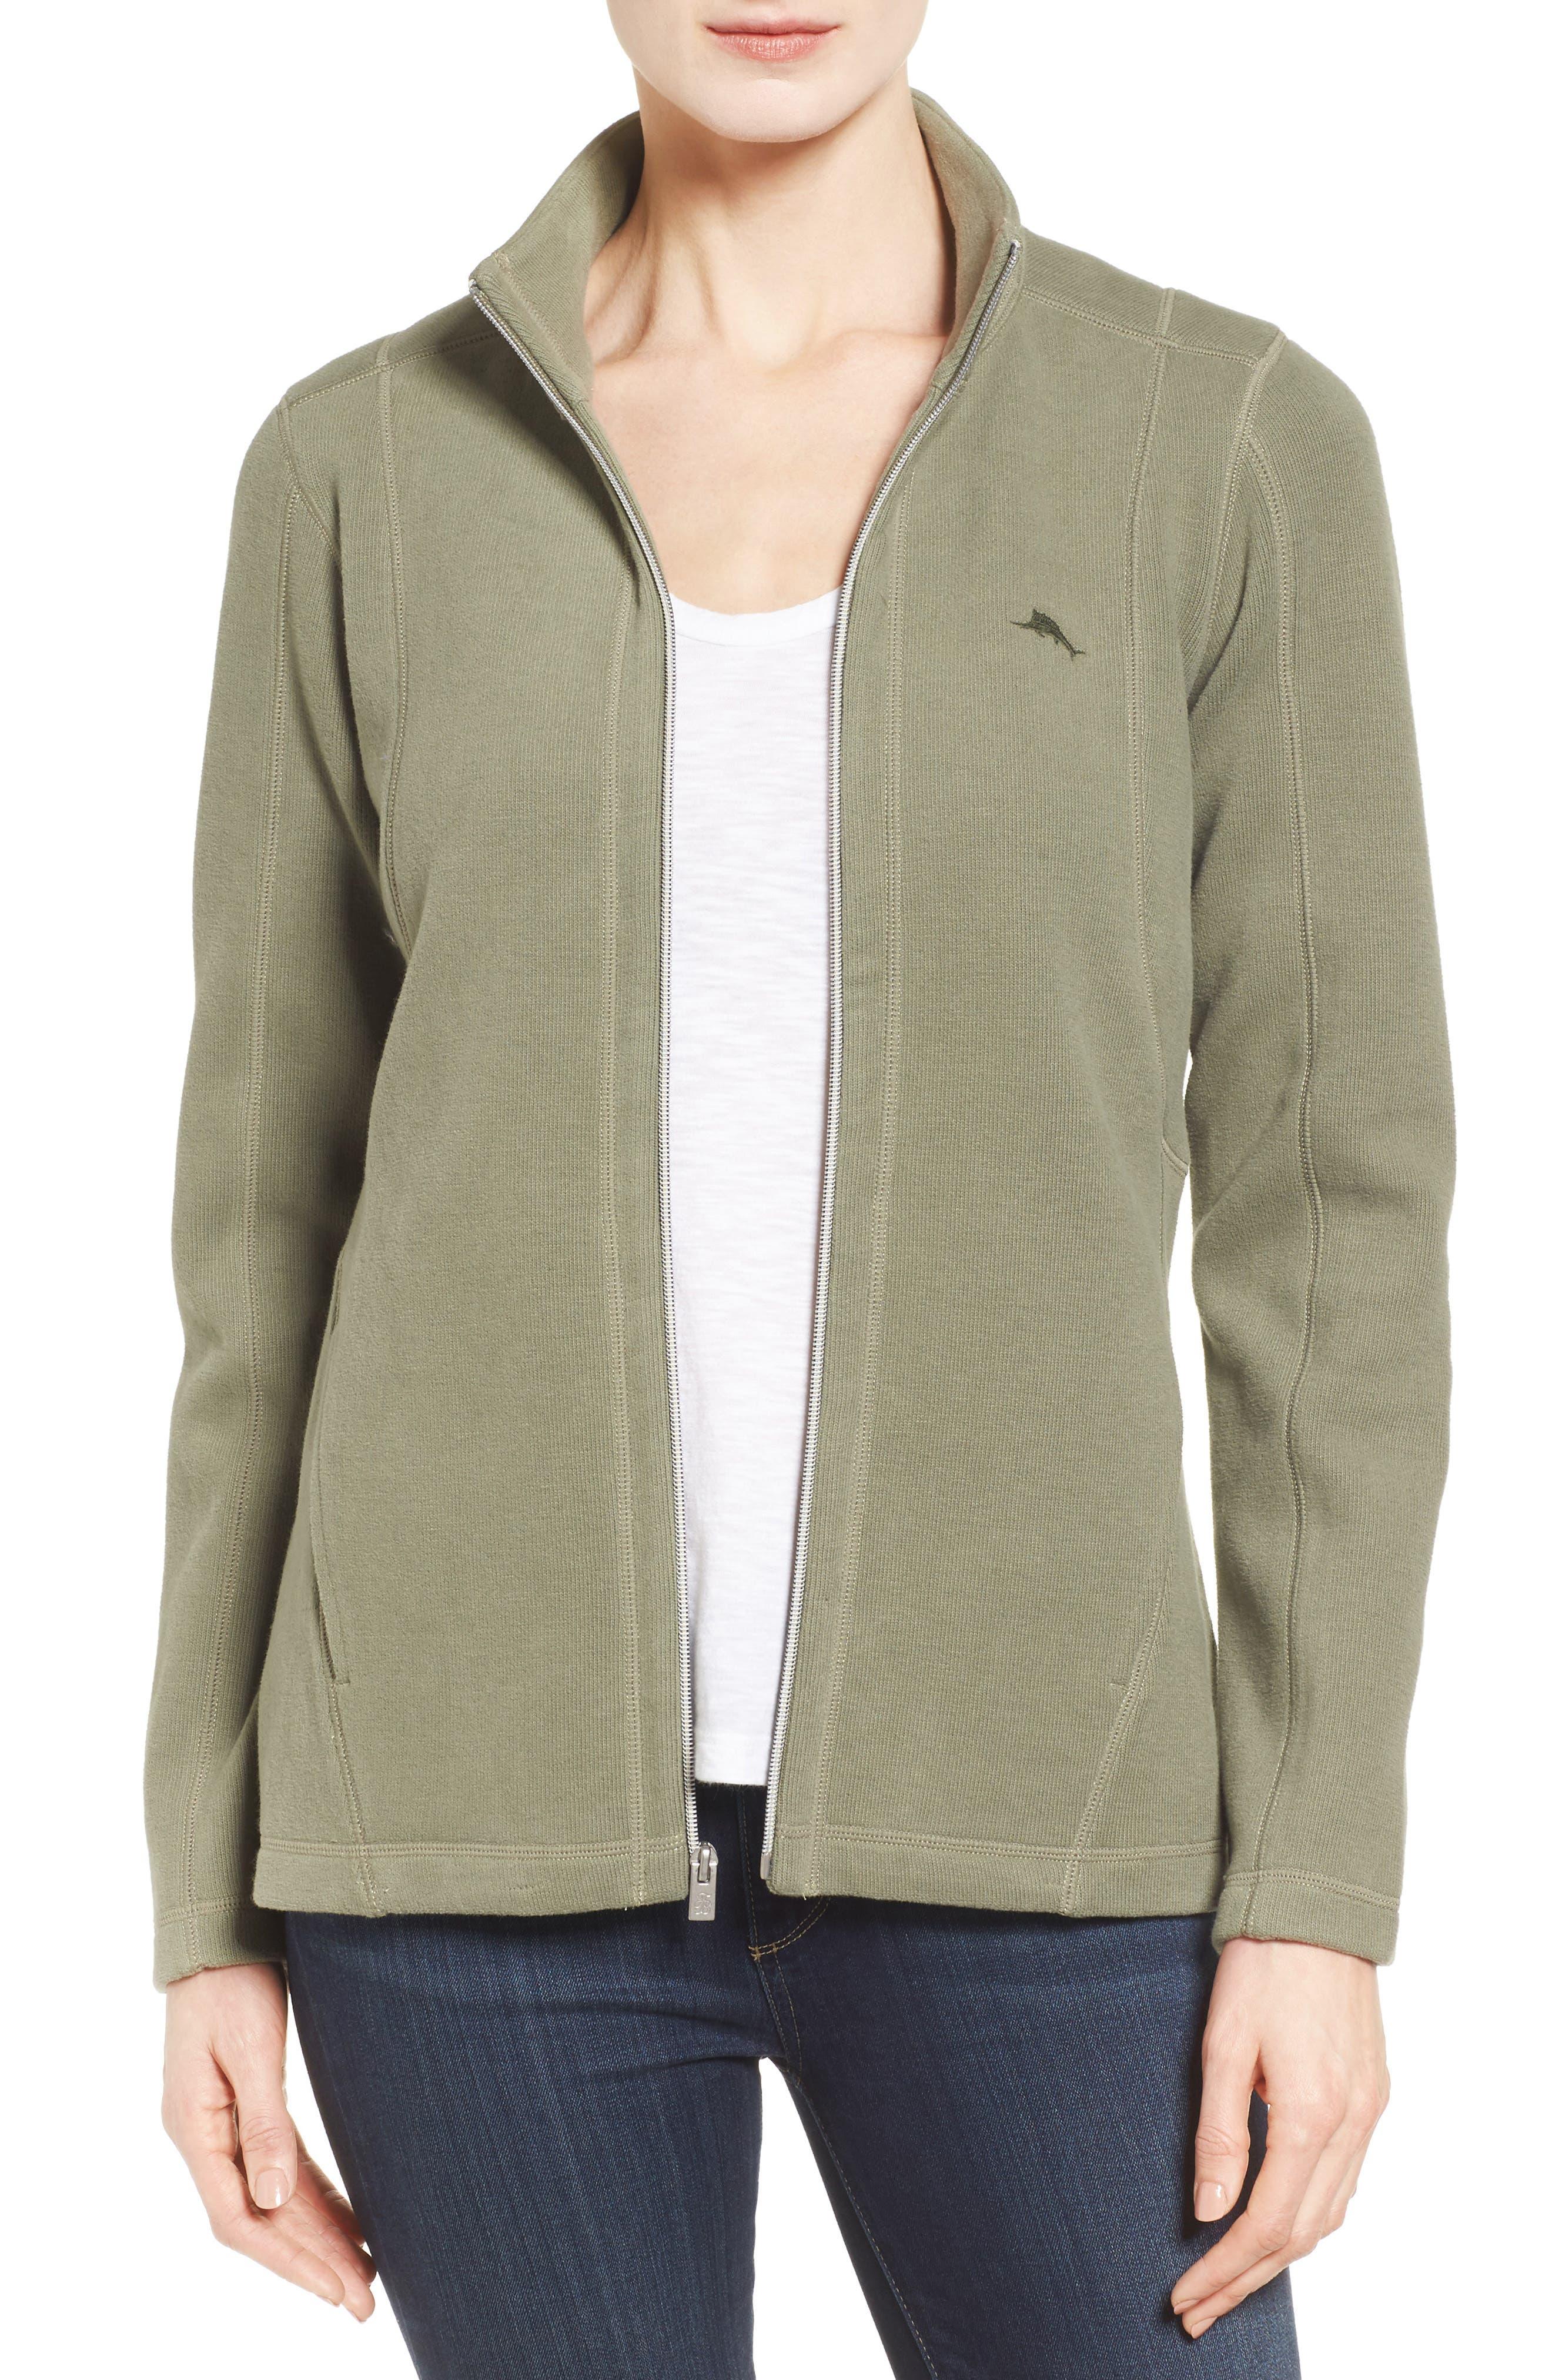 'Aruba' Full Zip Sweatshirt,                             Main thumbnail 3, color,